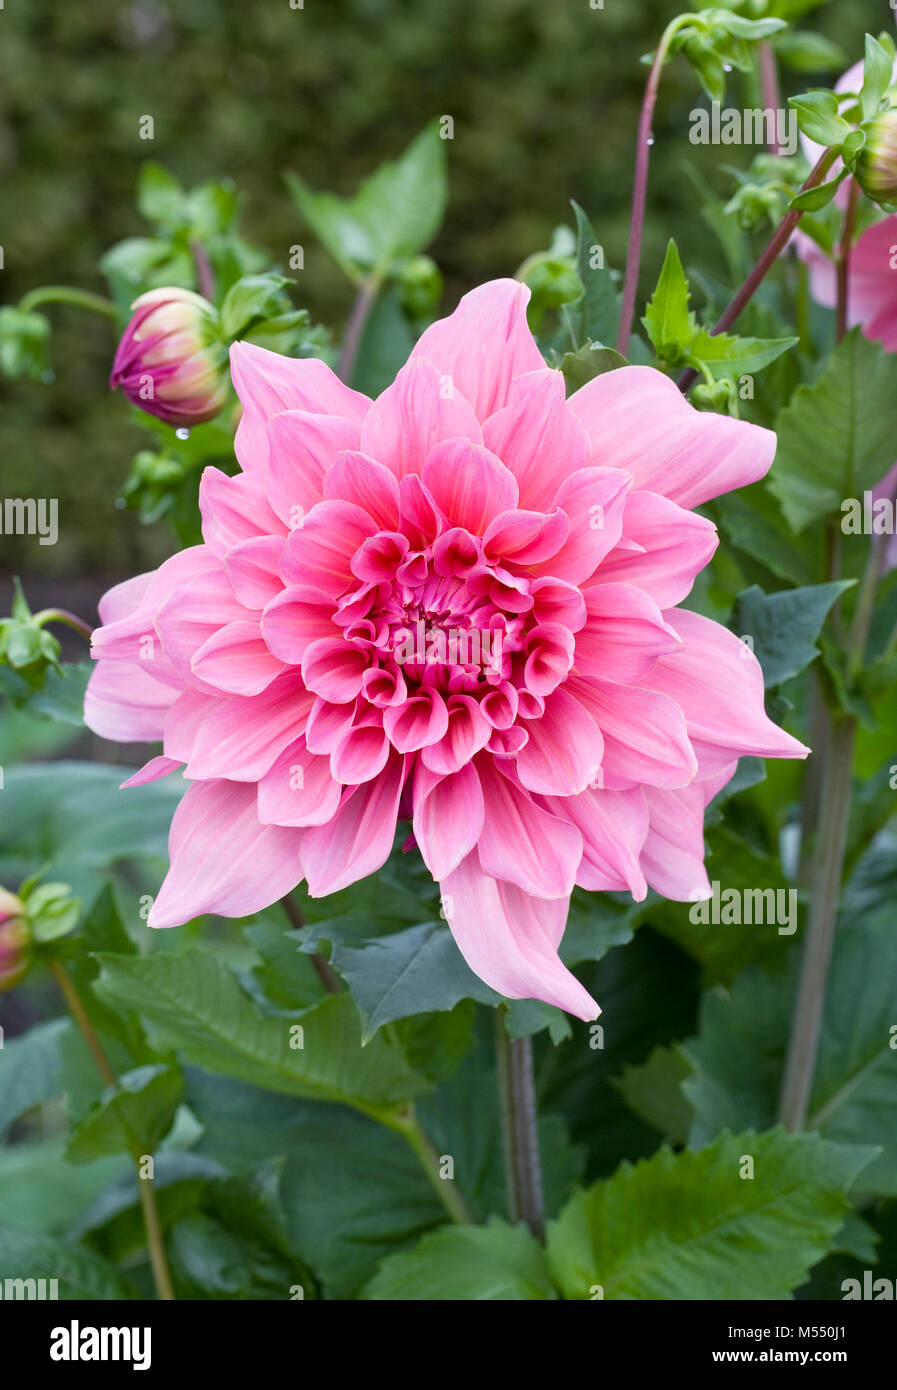 Dahlia 'Otto's Thrill' flower. - Stock Image